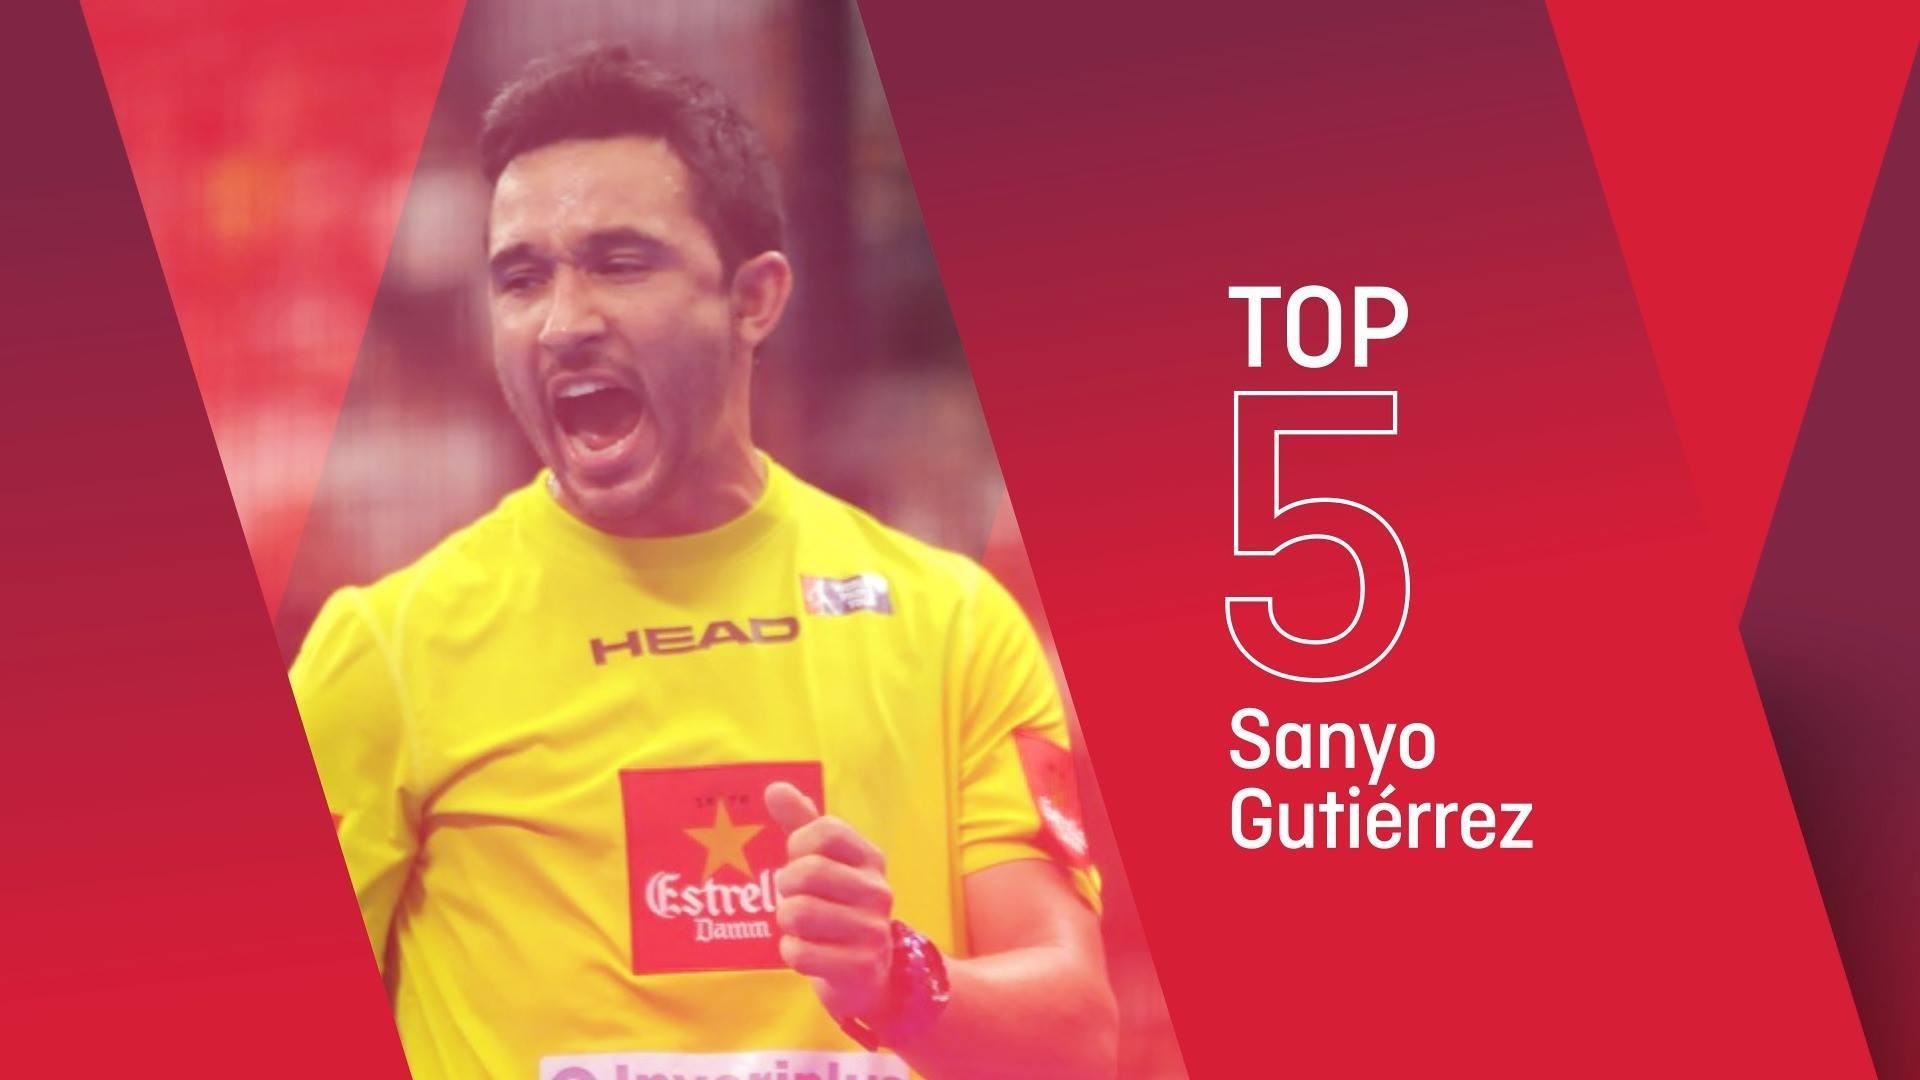 World Padel Tour   Top5 Sanyo Gutirrez 2018   World Padel Tour 1920x1080